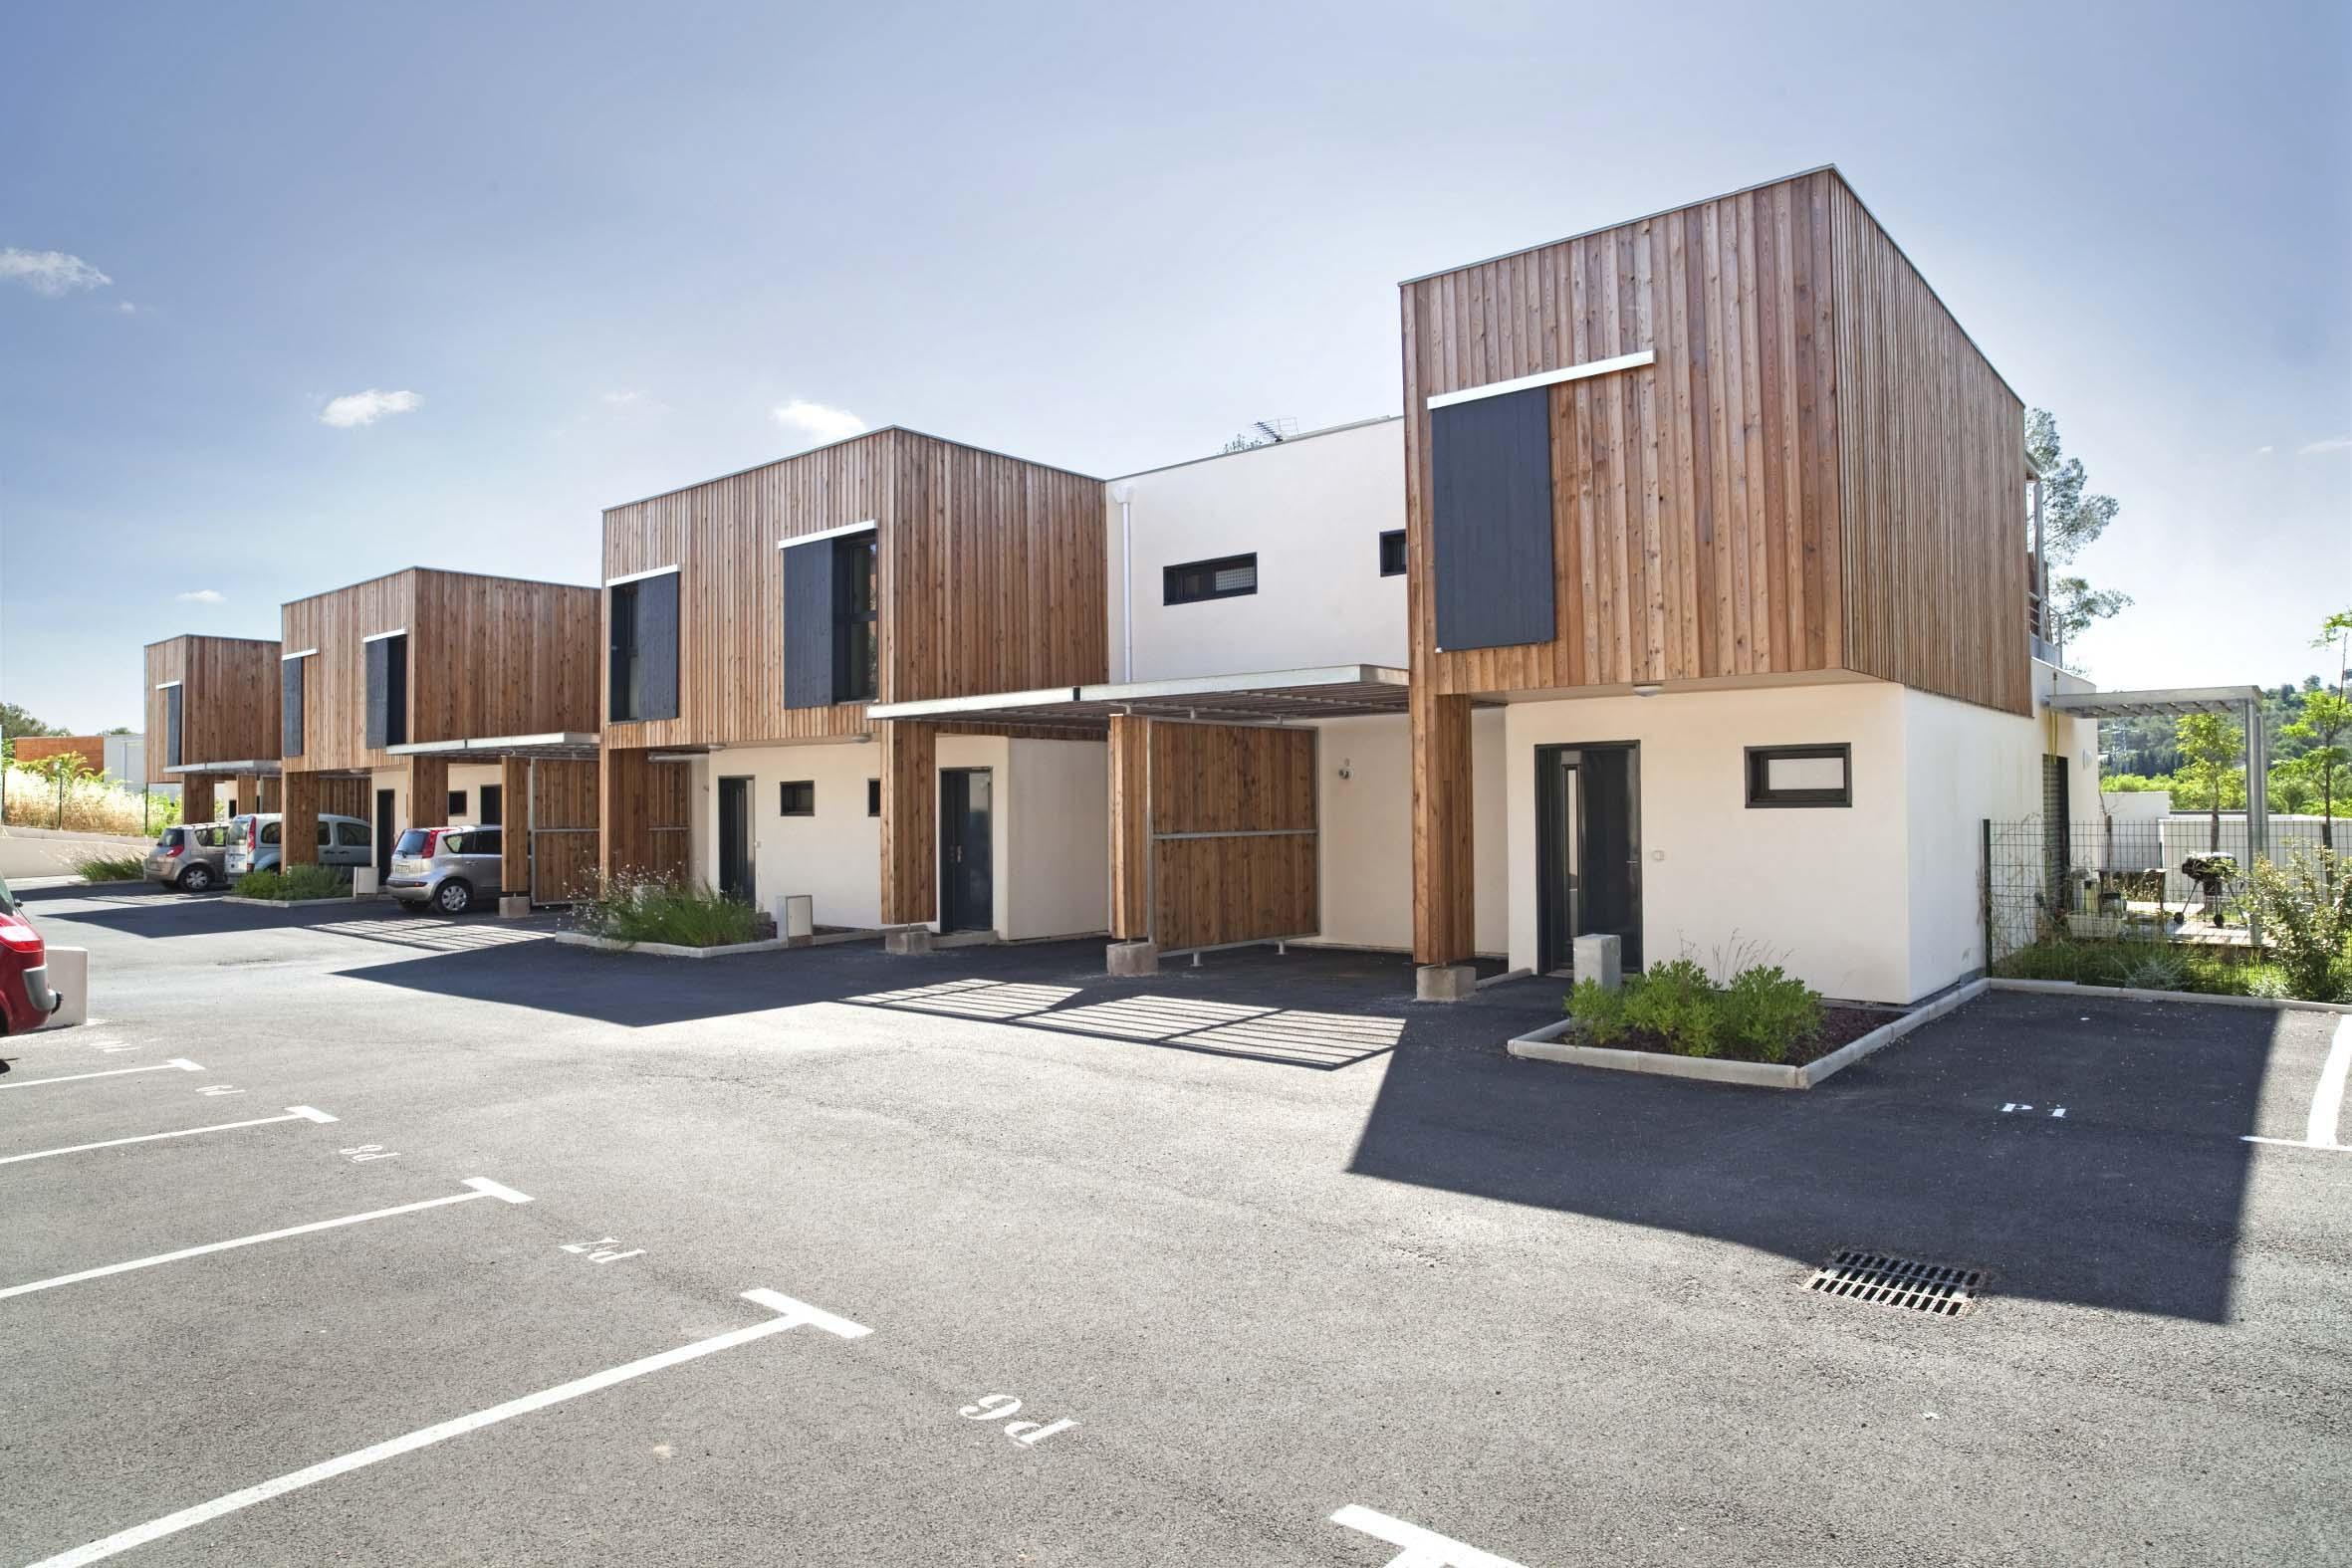 Maison mitoyenne ossature bois Hérault BF Architecture 1